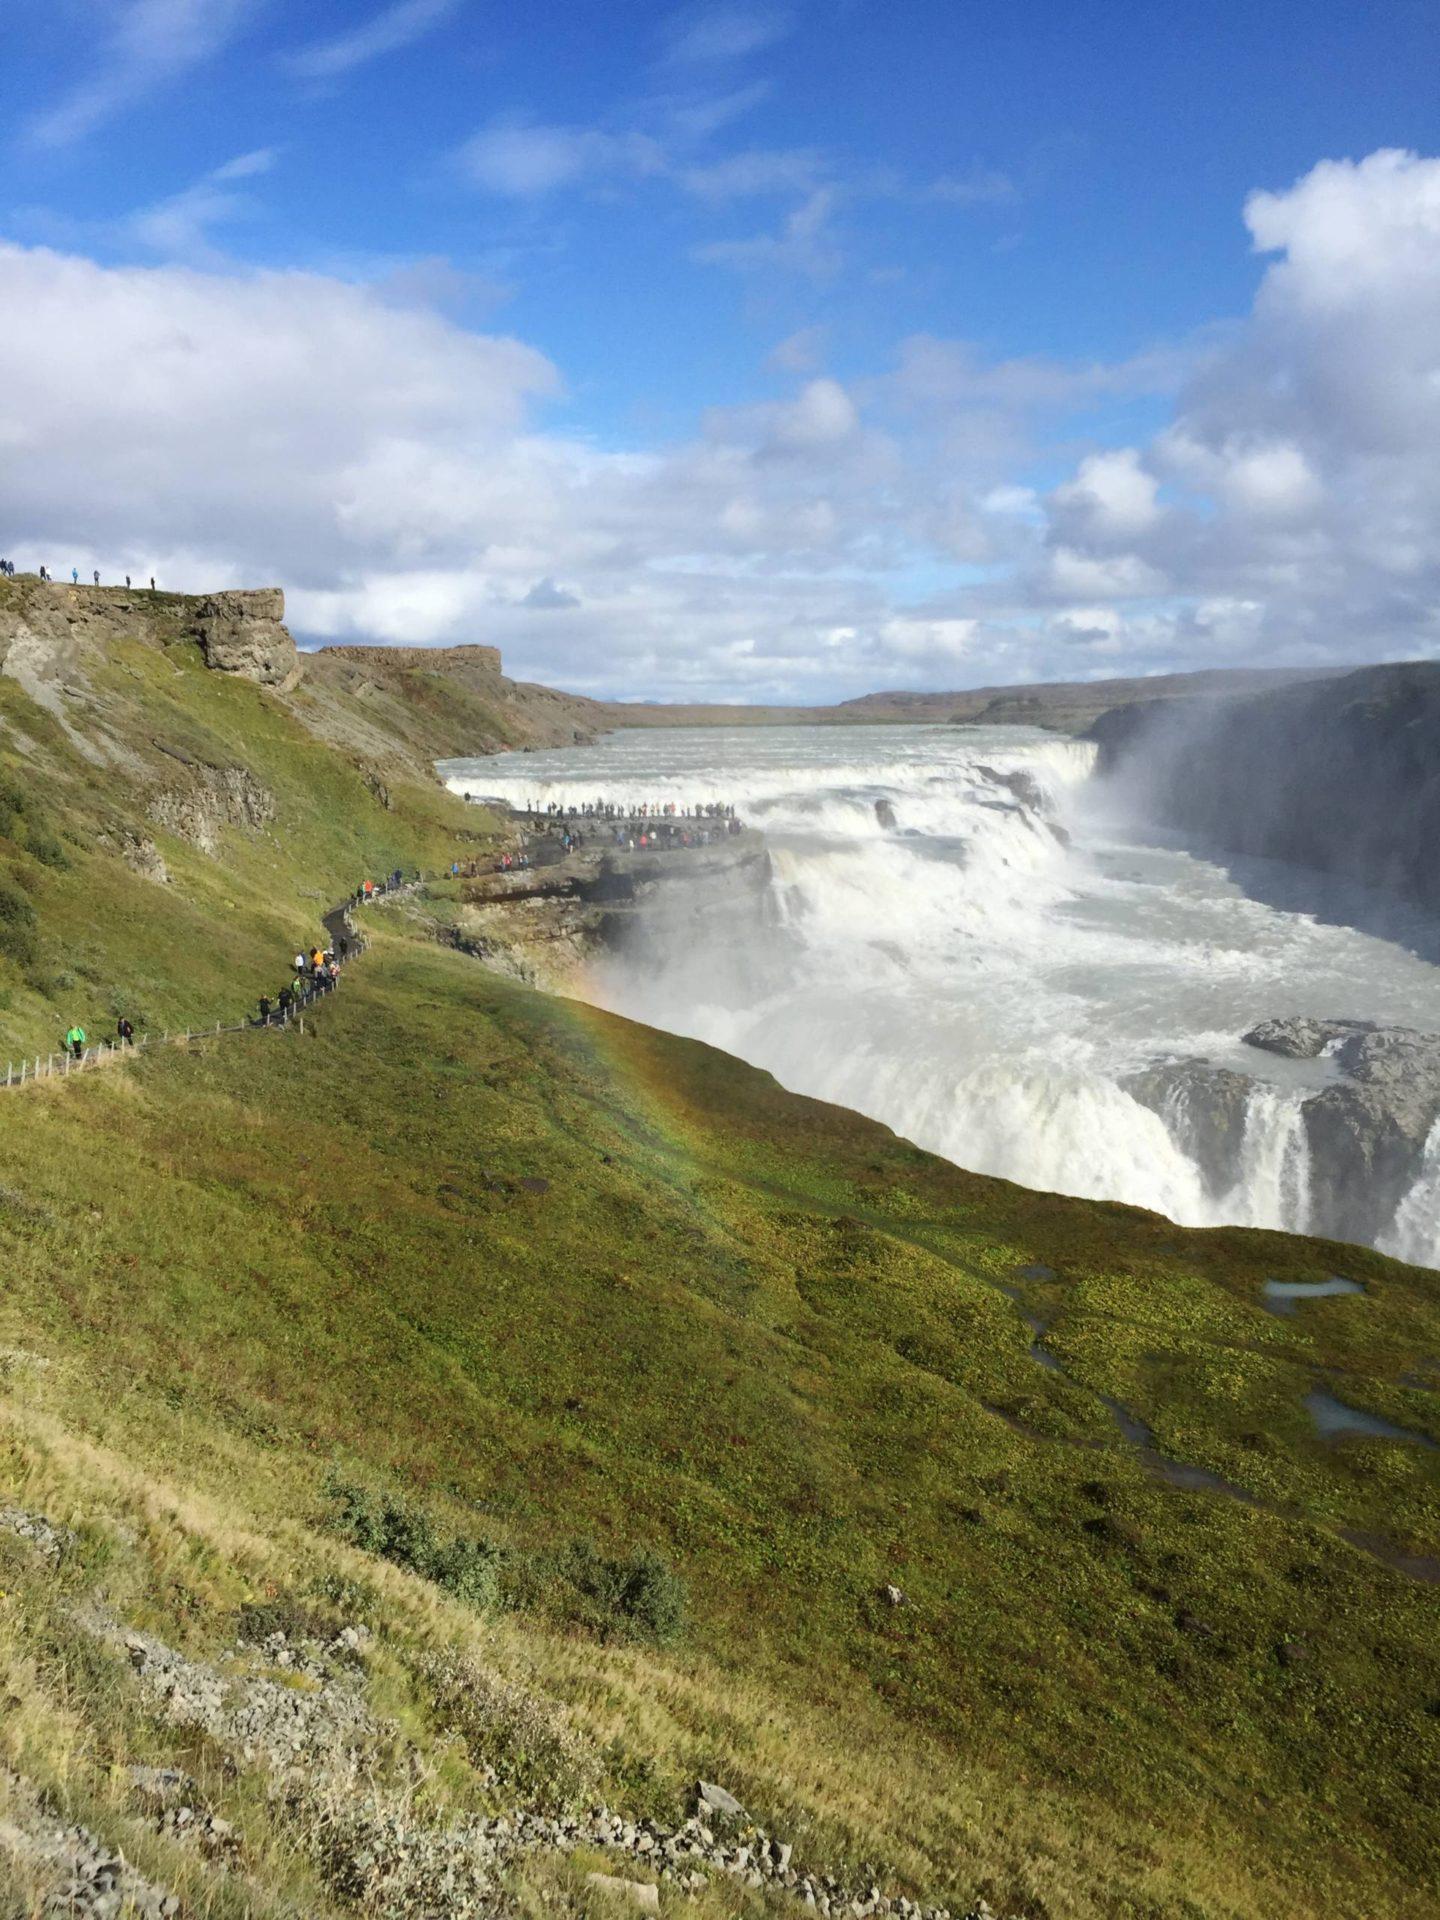 Emma Victoria Stokes Iceland Reykjavik Mountain View Gullfoss Golden Circle Tour Rainbow